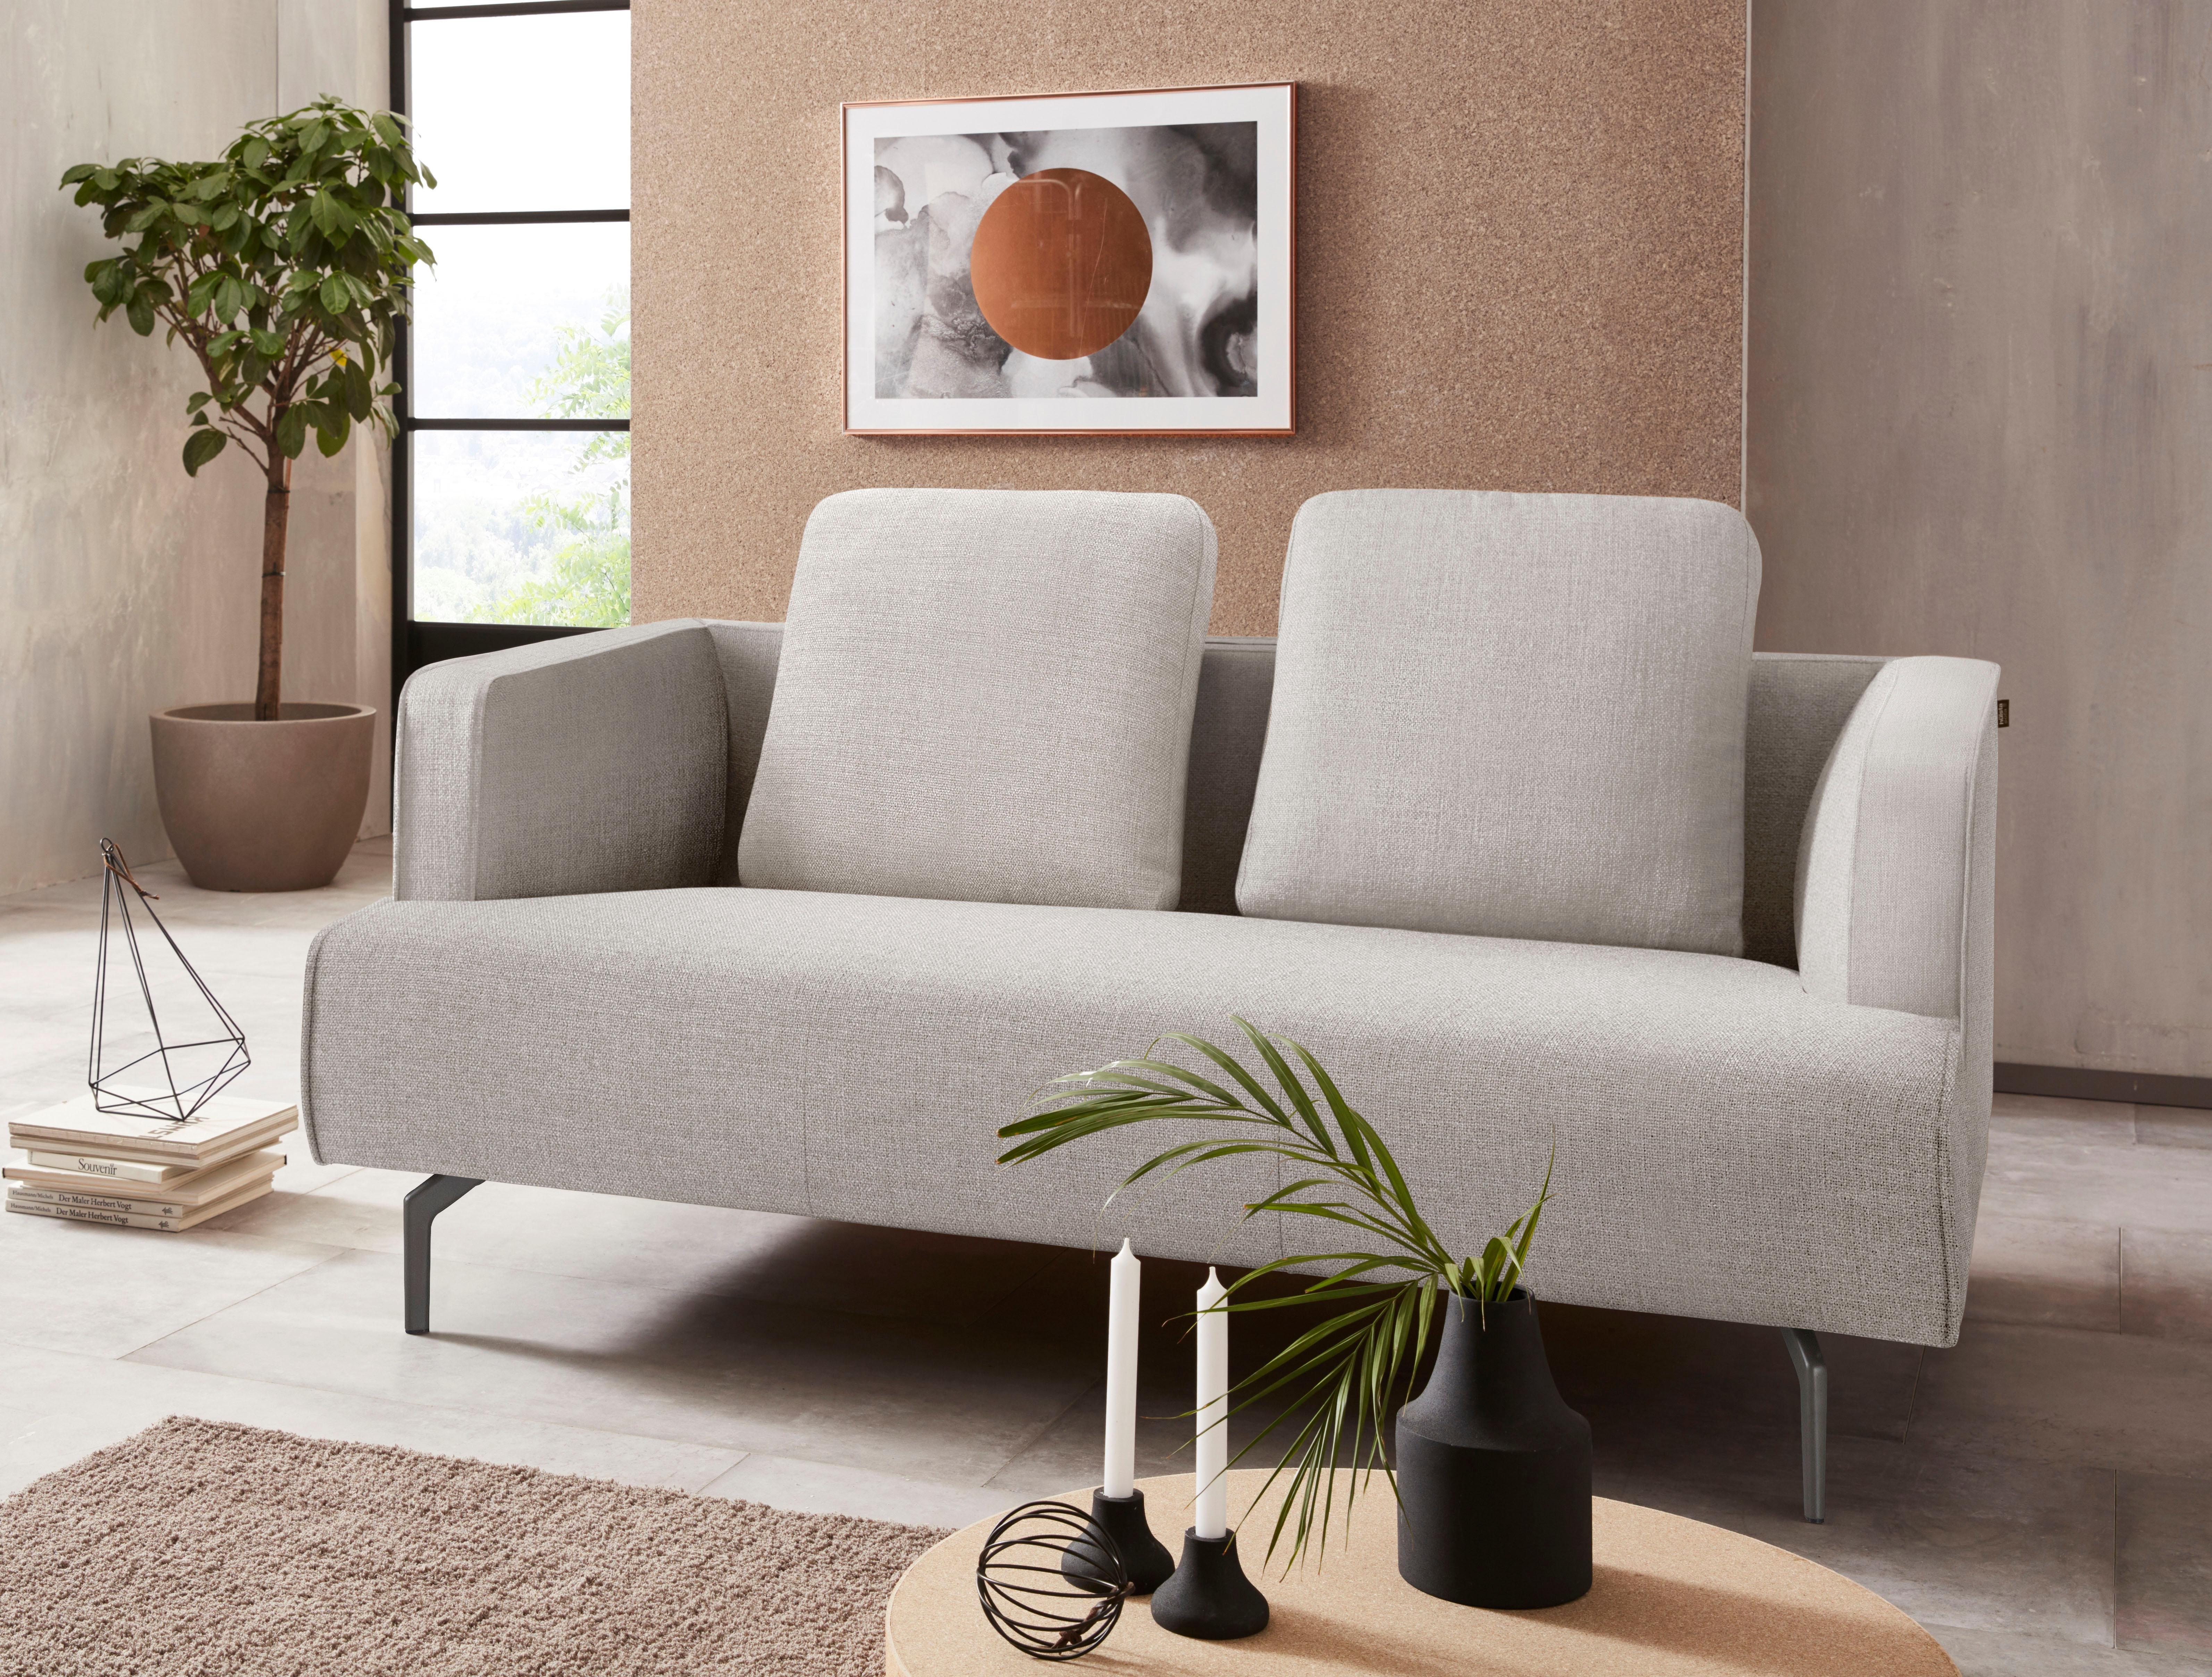 Hülsta Sofa 2 Sitzer Sofa »hs.440« Wahlweise In Stoff Oder Leder, Gussfüße  Umbragrau